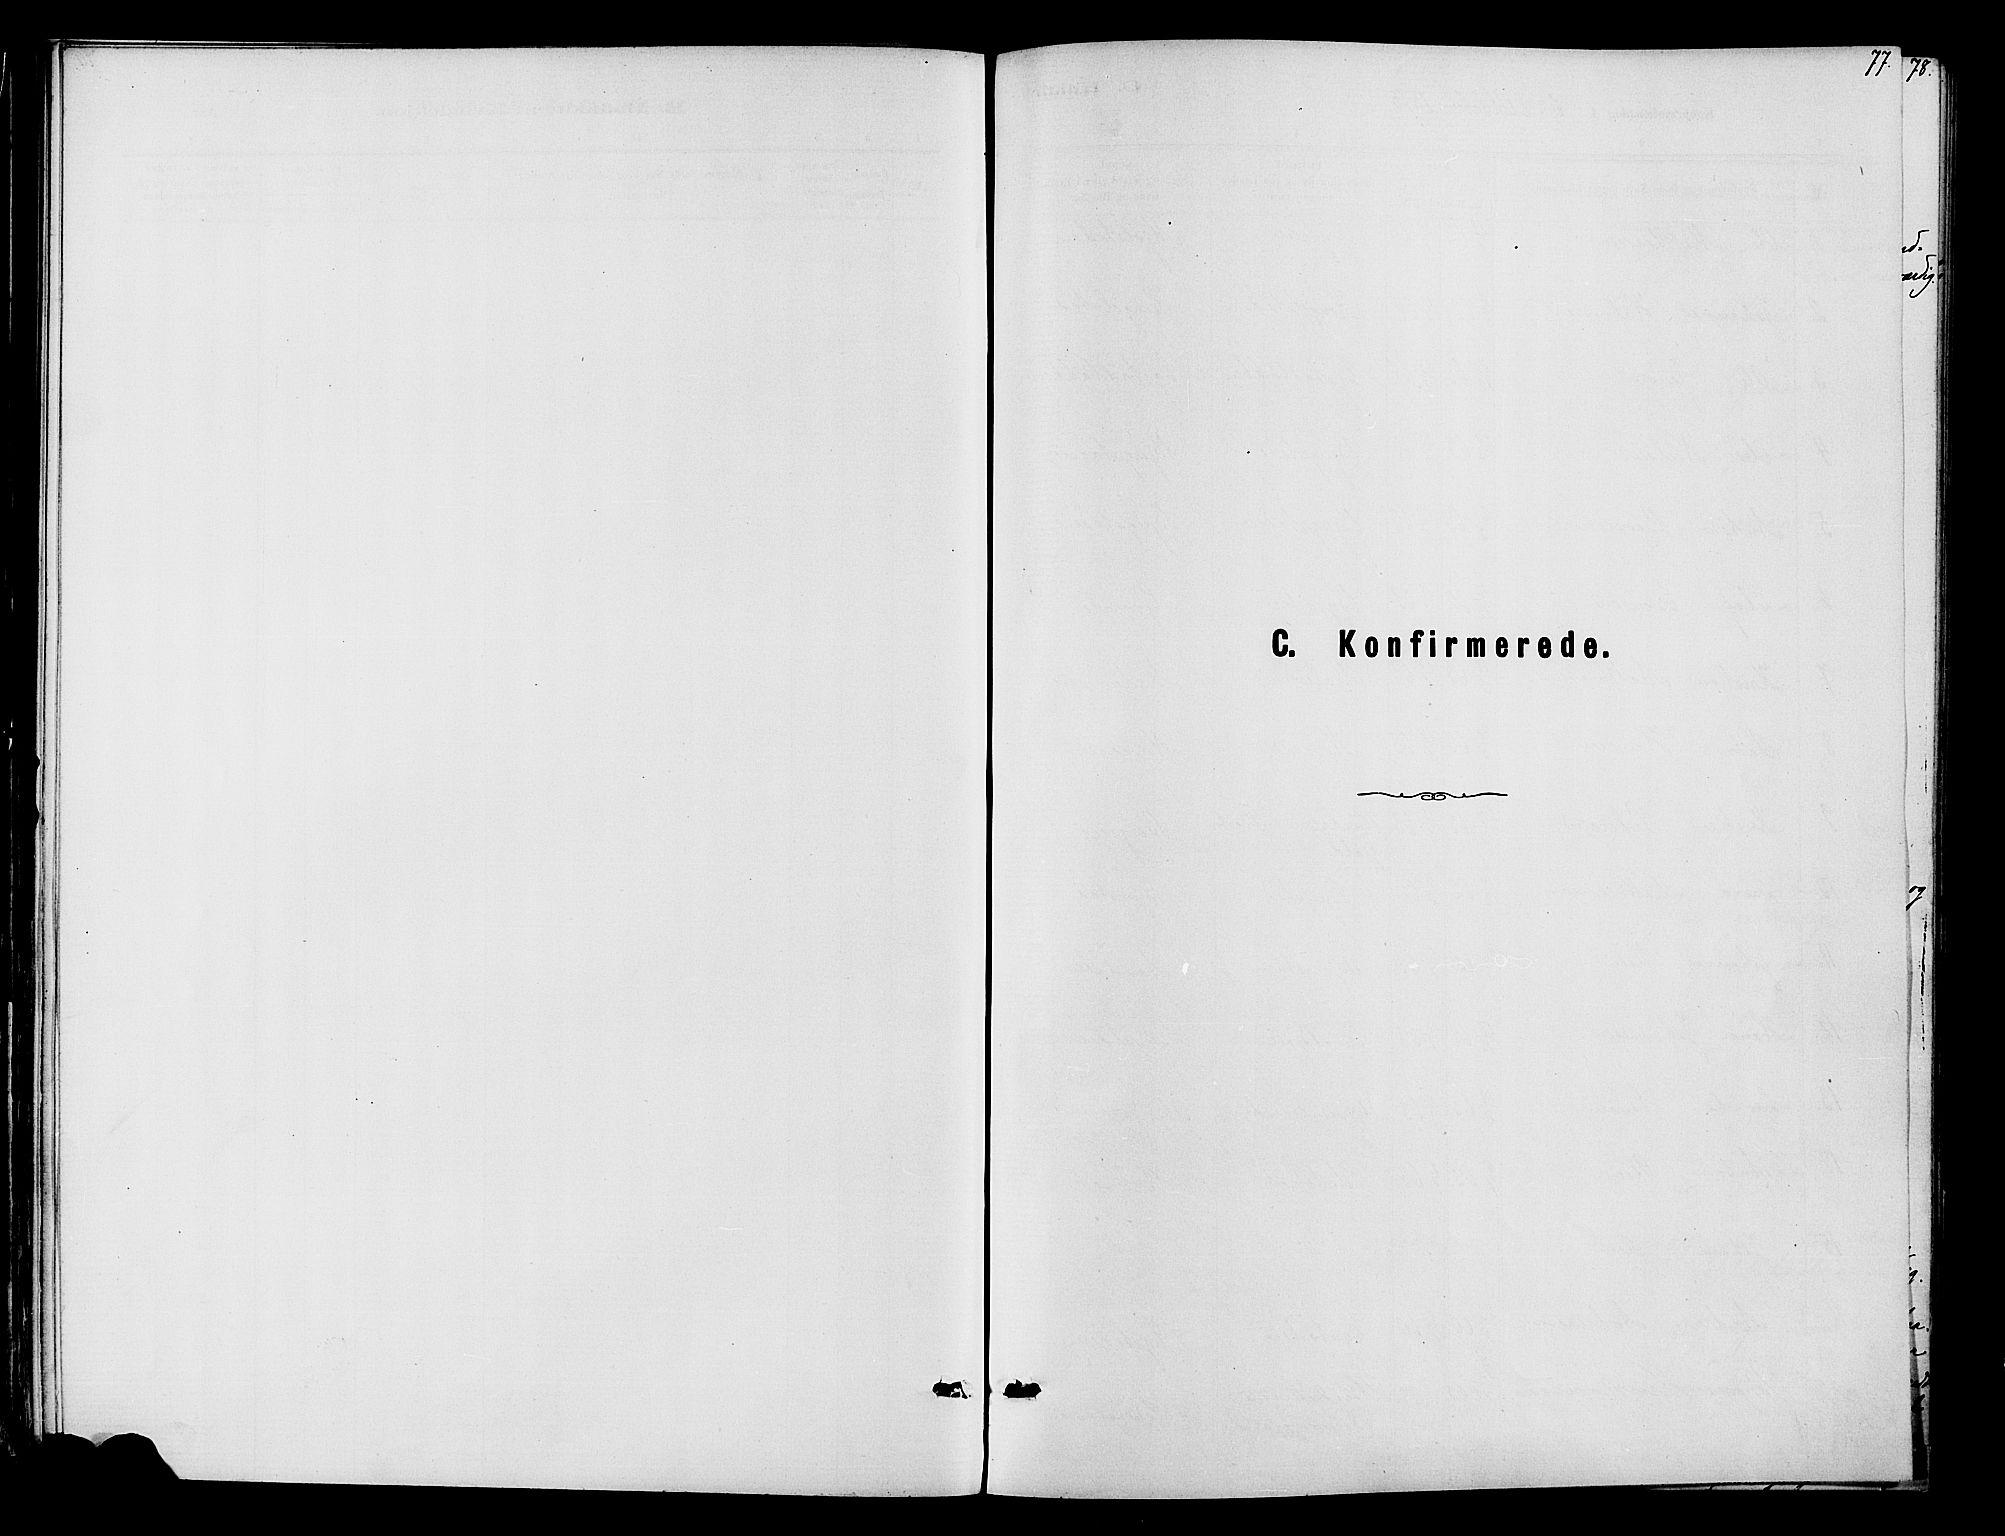 SAH, Vardal prestekontor, H/Ha/Haa/L0010: Ministerialbok nr. 10, 1878-1893, s. 77